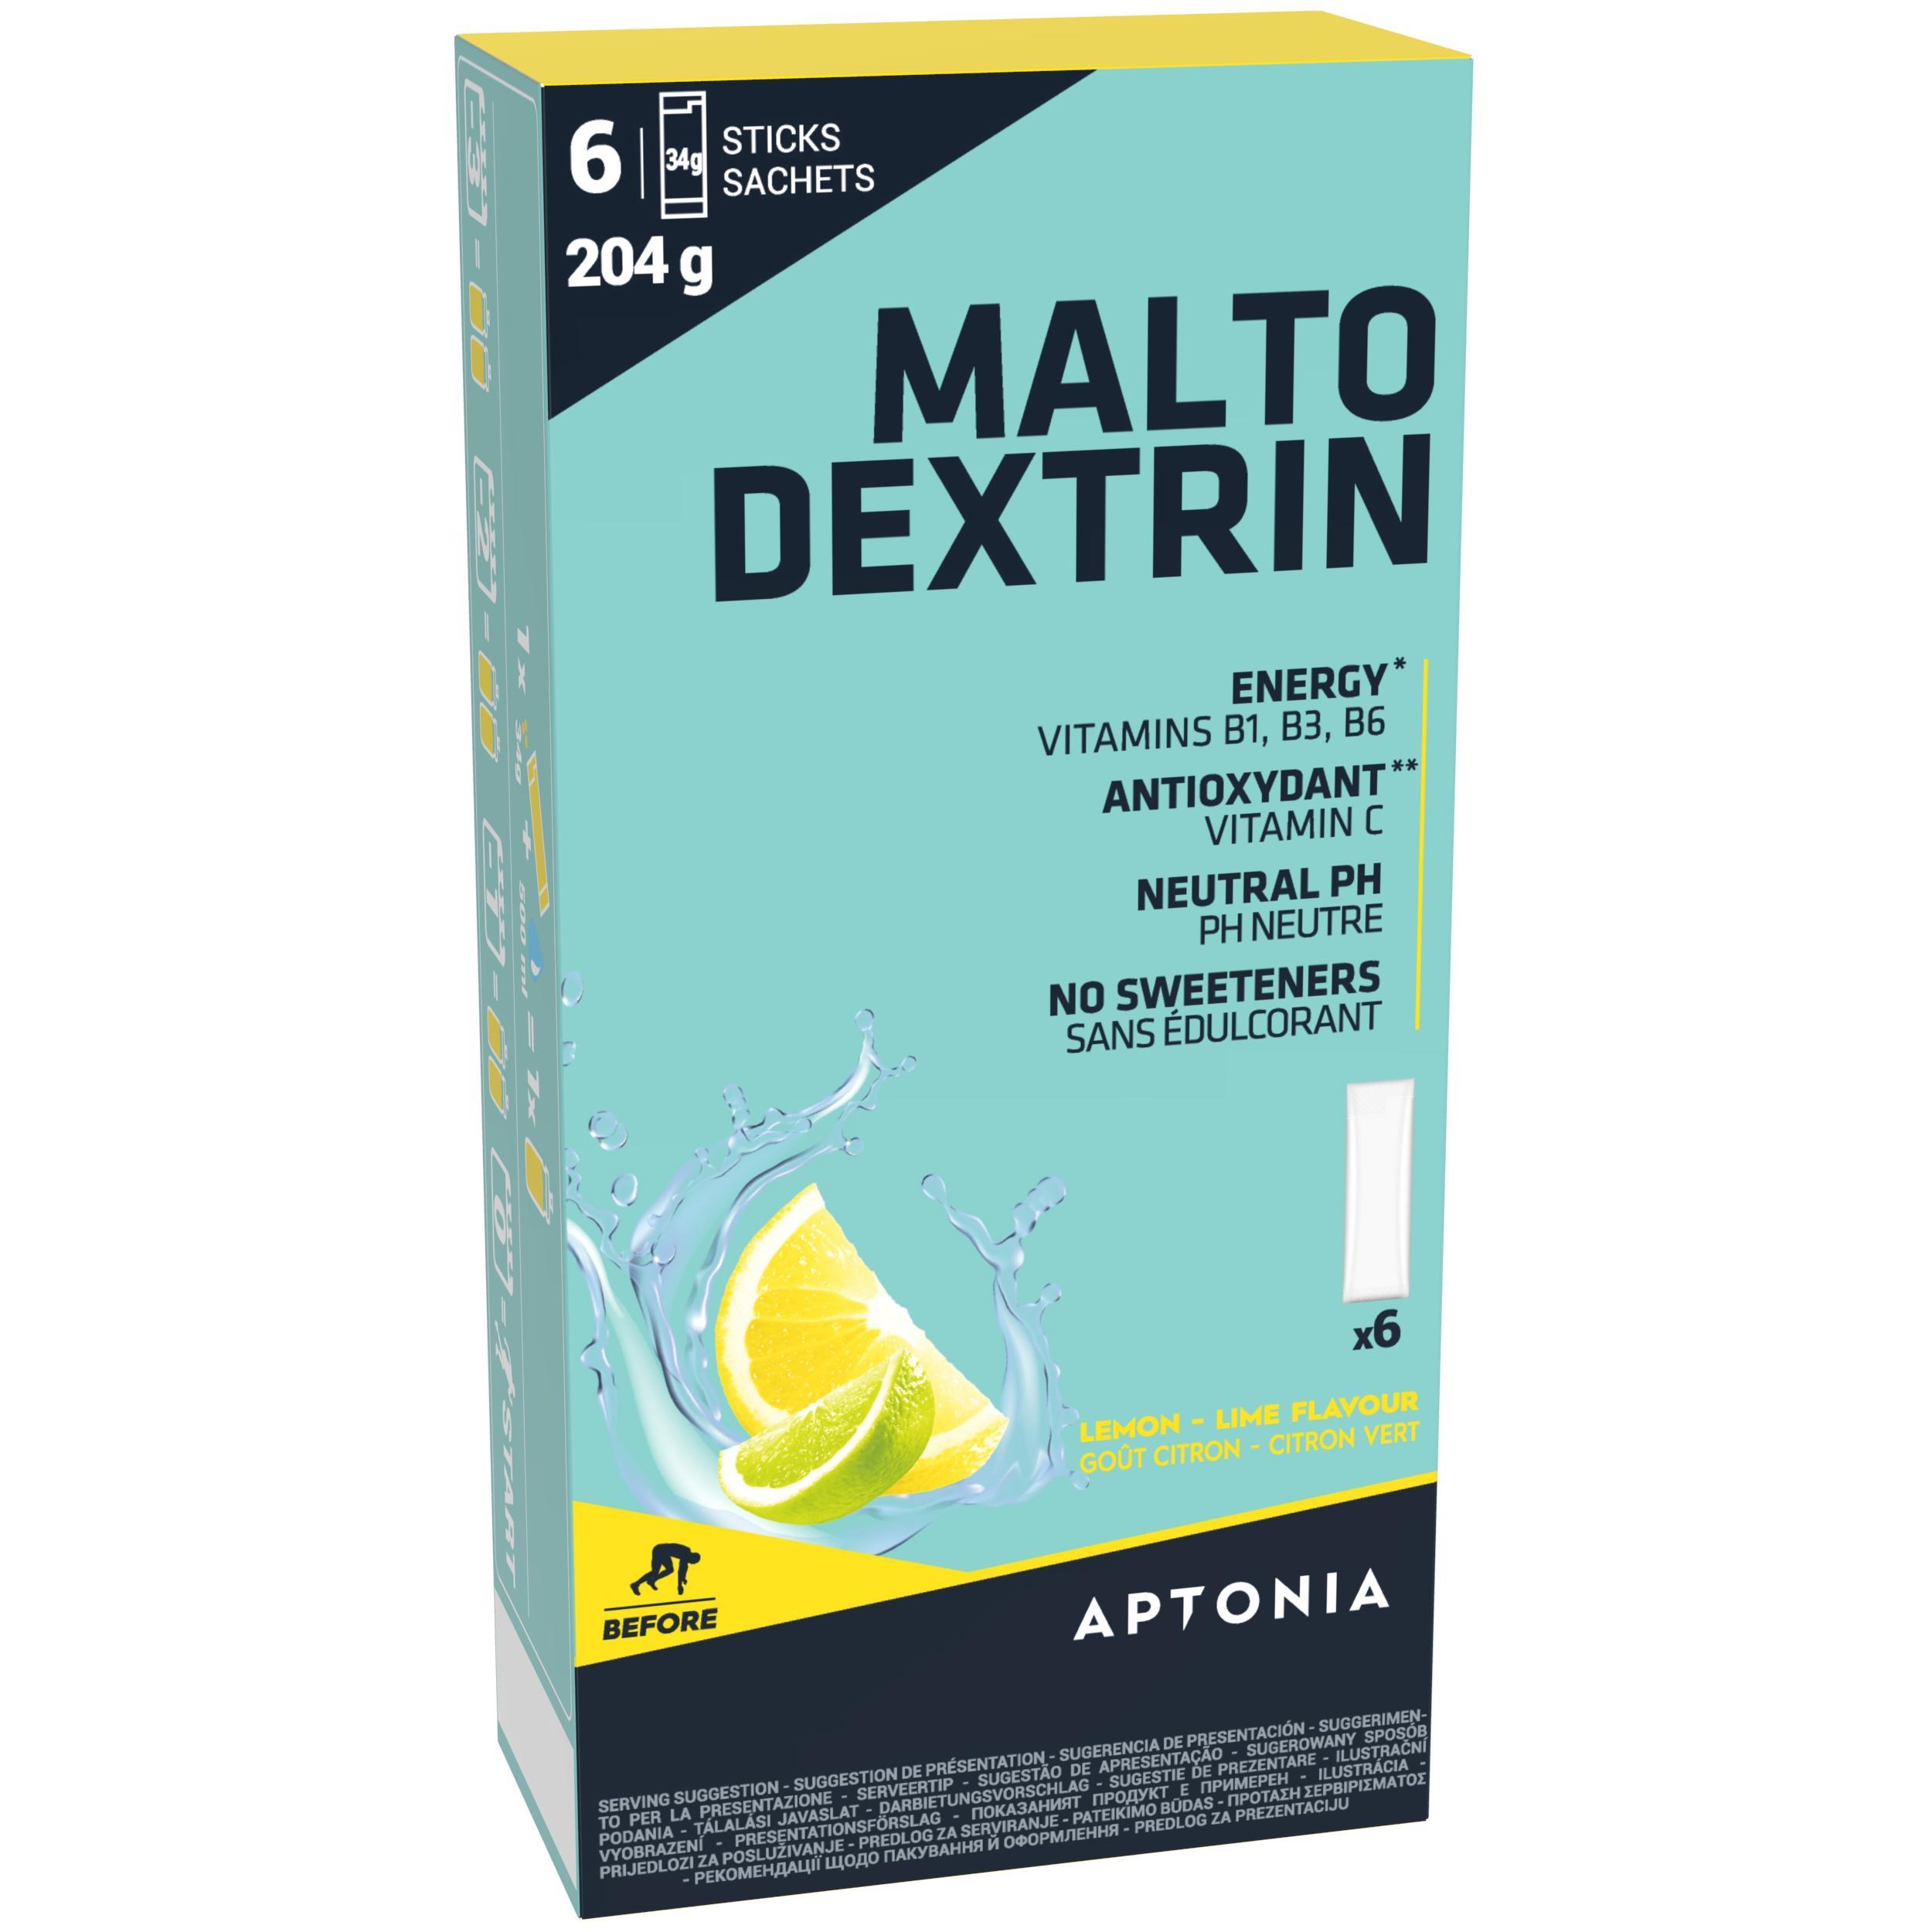 Pudră Maltodextrină 6x34g de la APTONIA